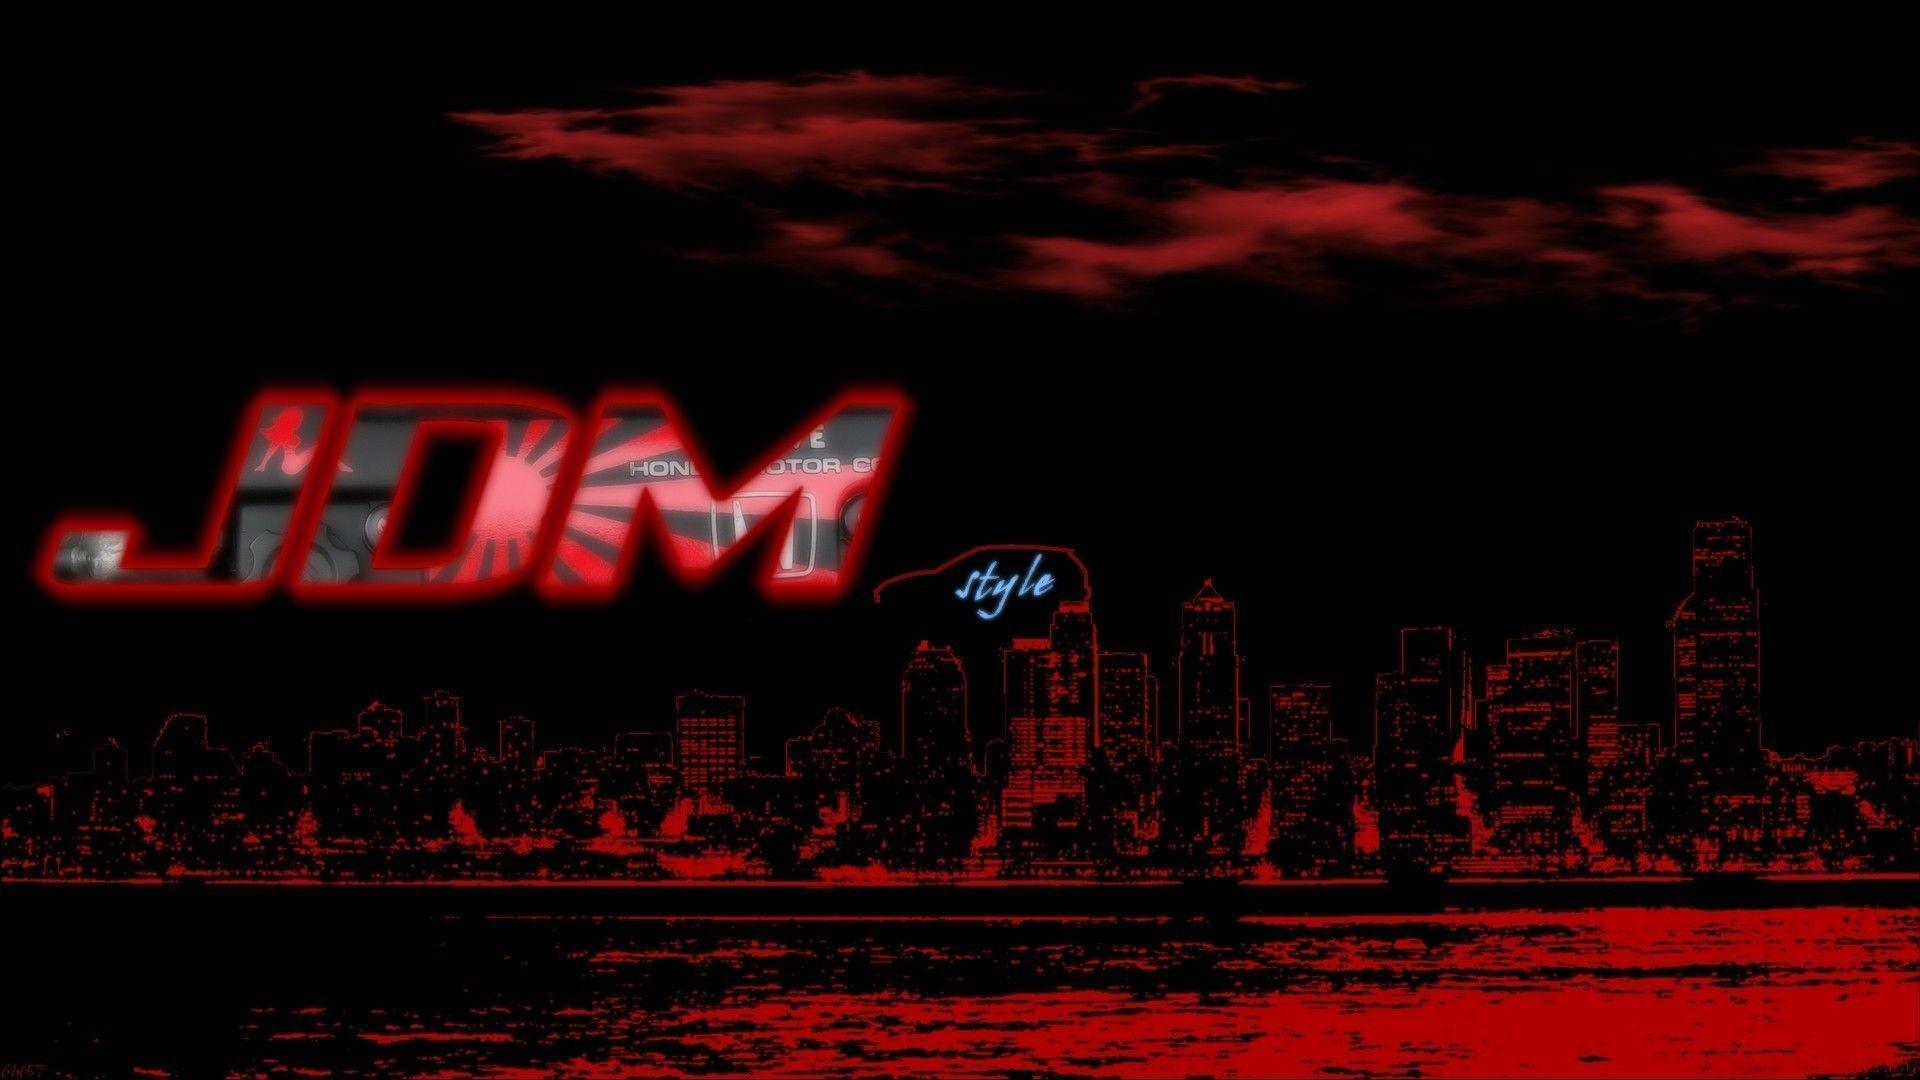 Res: 1920x1080, Jdm Honda Logo Wallpaper - image #125